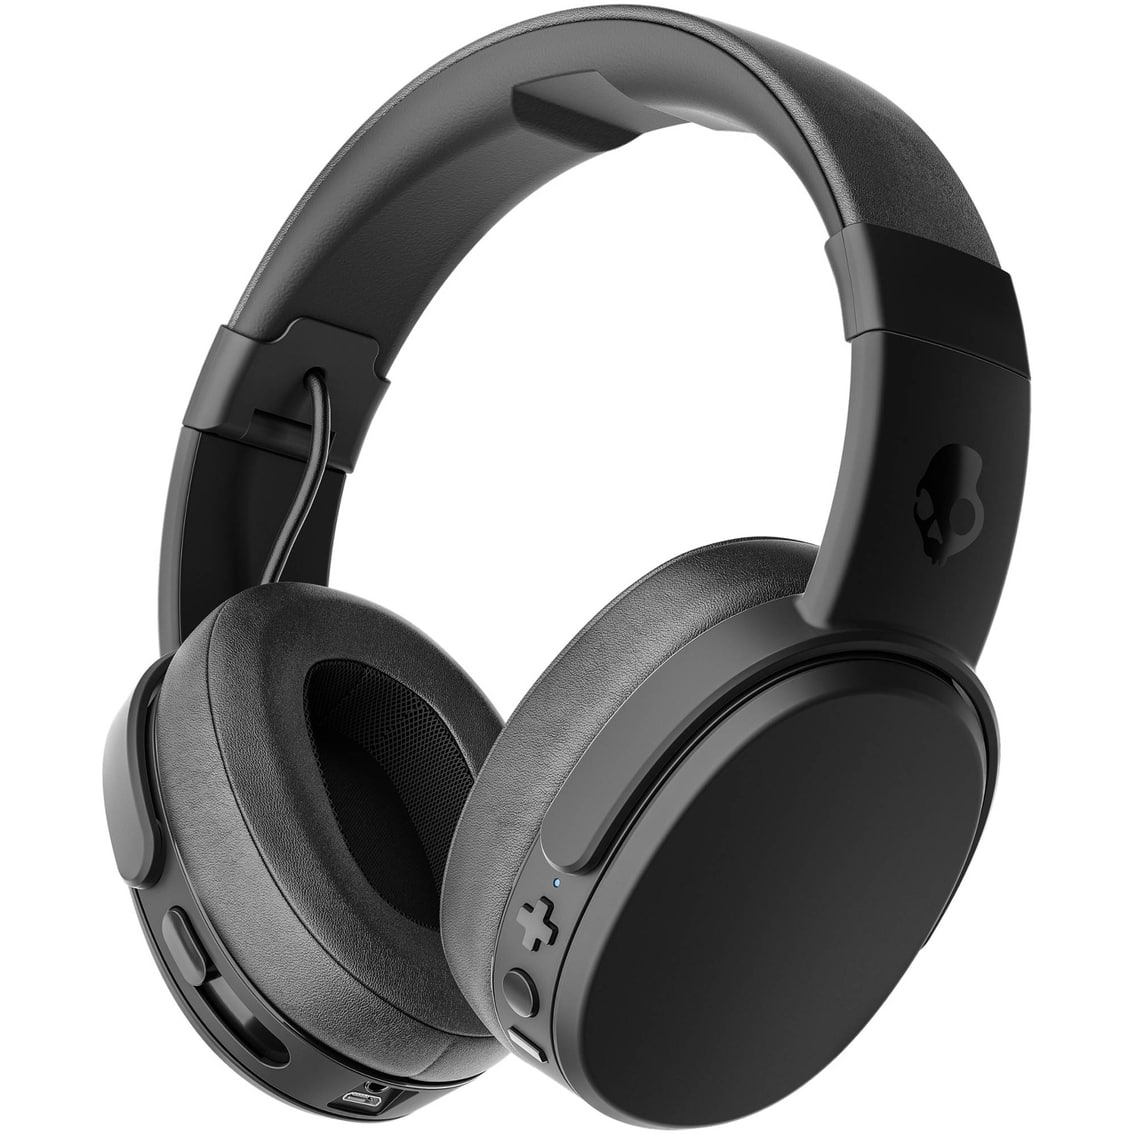 Skullcandy Crusher Wireless Bluetooth Headphones $64.50 shipped (Aafes/ShopExchange Mil/Vet/Ret only)